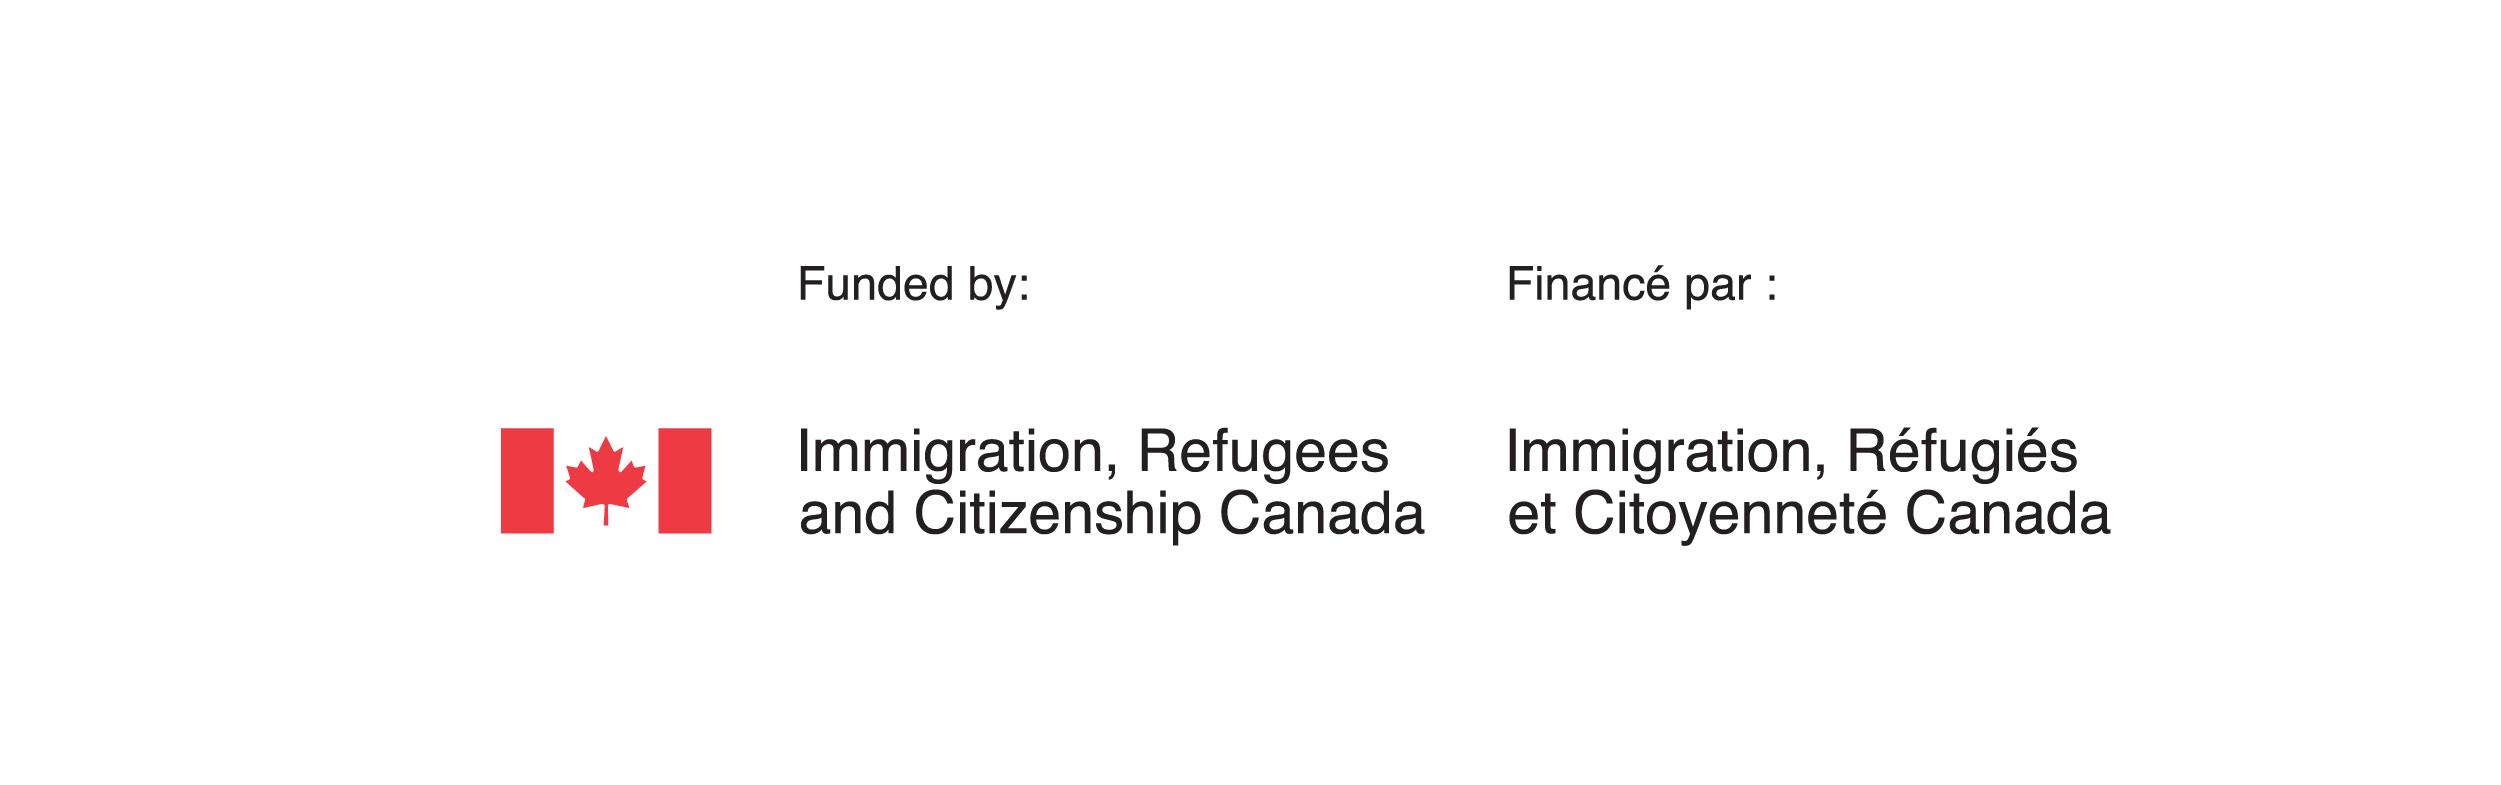 Immigration, Refugees and Citizenship Canada logo | YWCA Hamilton